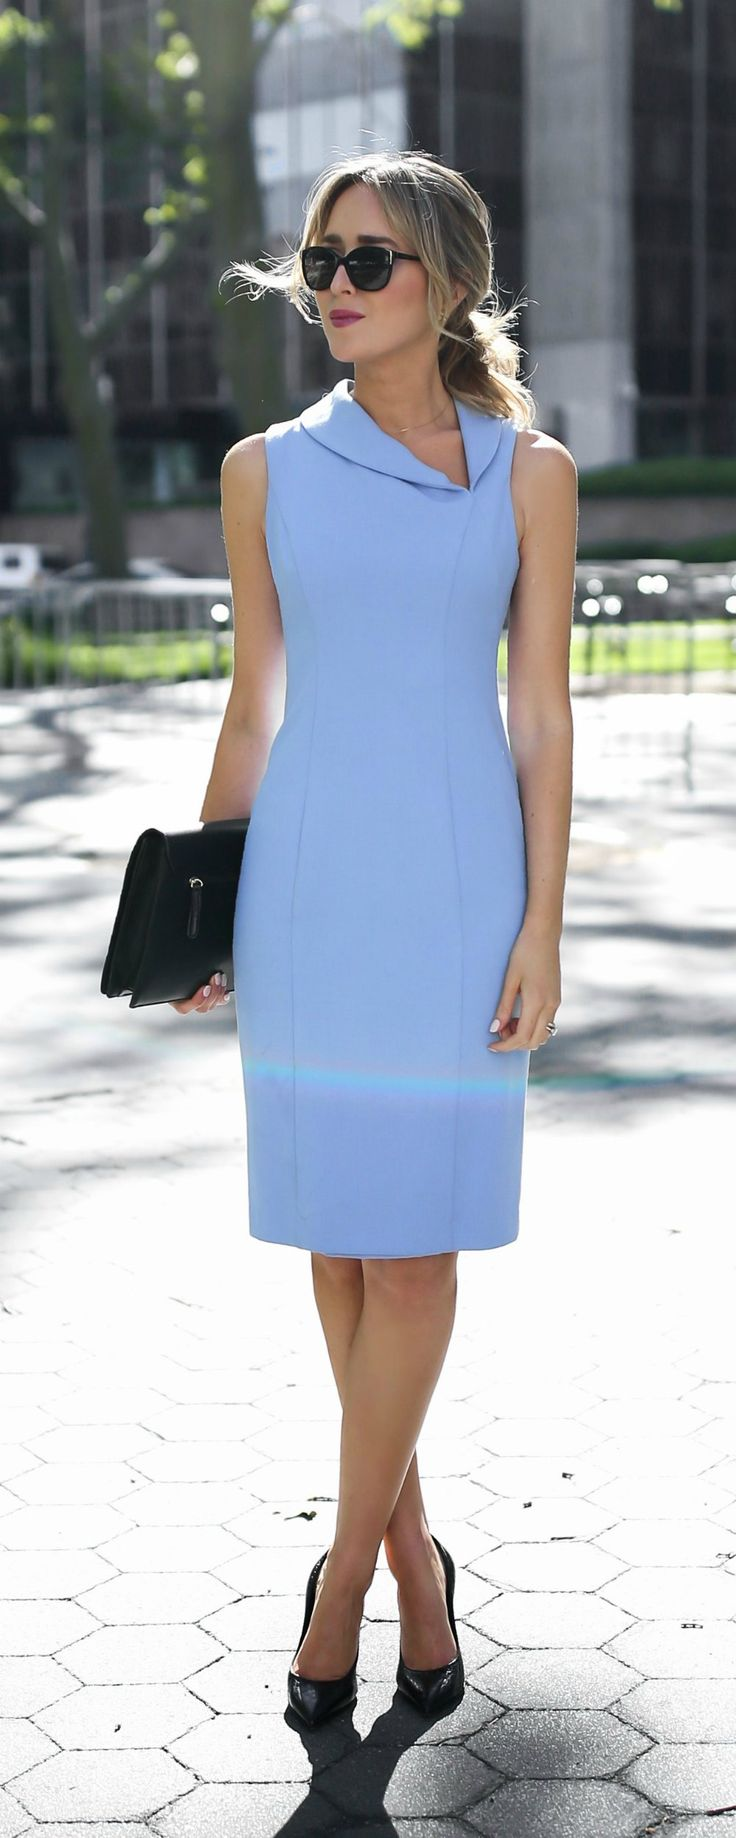 Best 25+ Classic dresses ideas on Pinterest